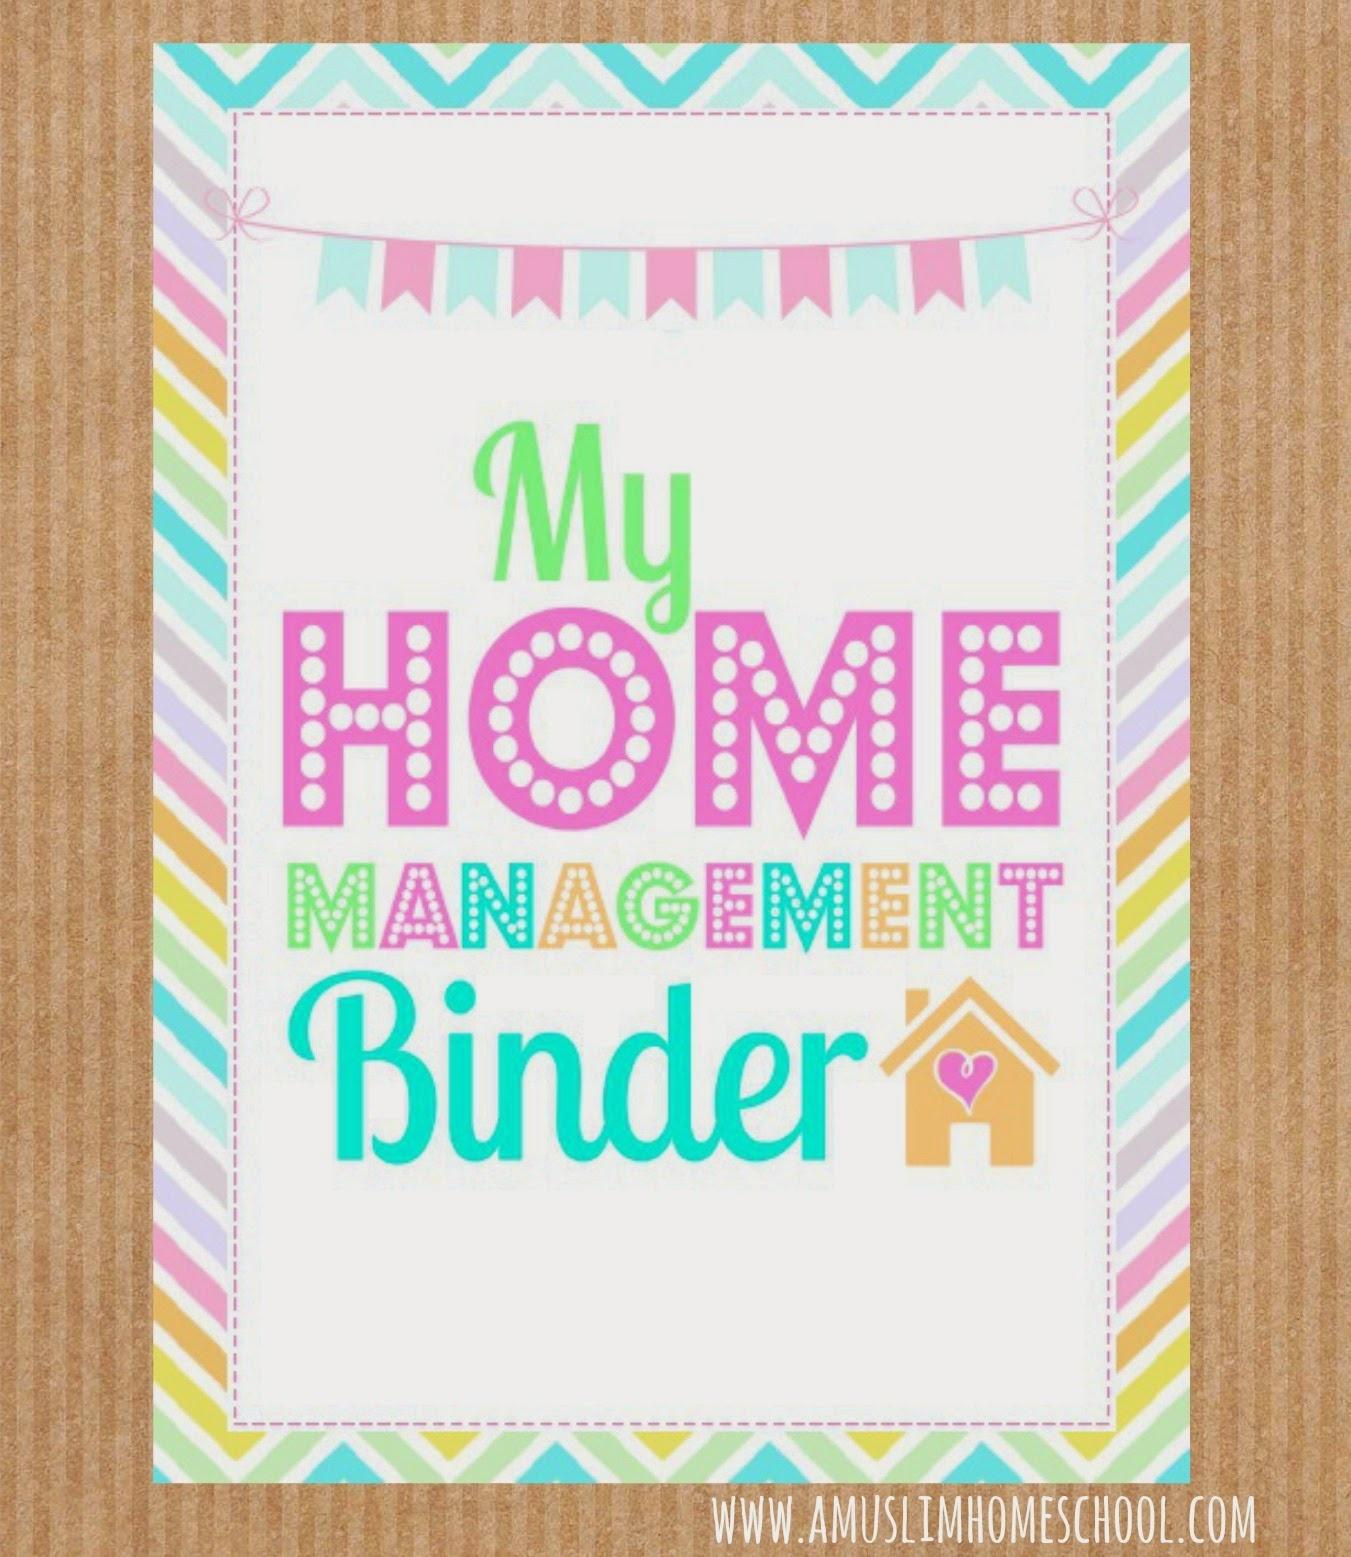 A Muslim Homeschool: August 2014 - Free Home Management Binder Printables 2017